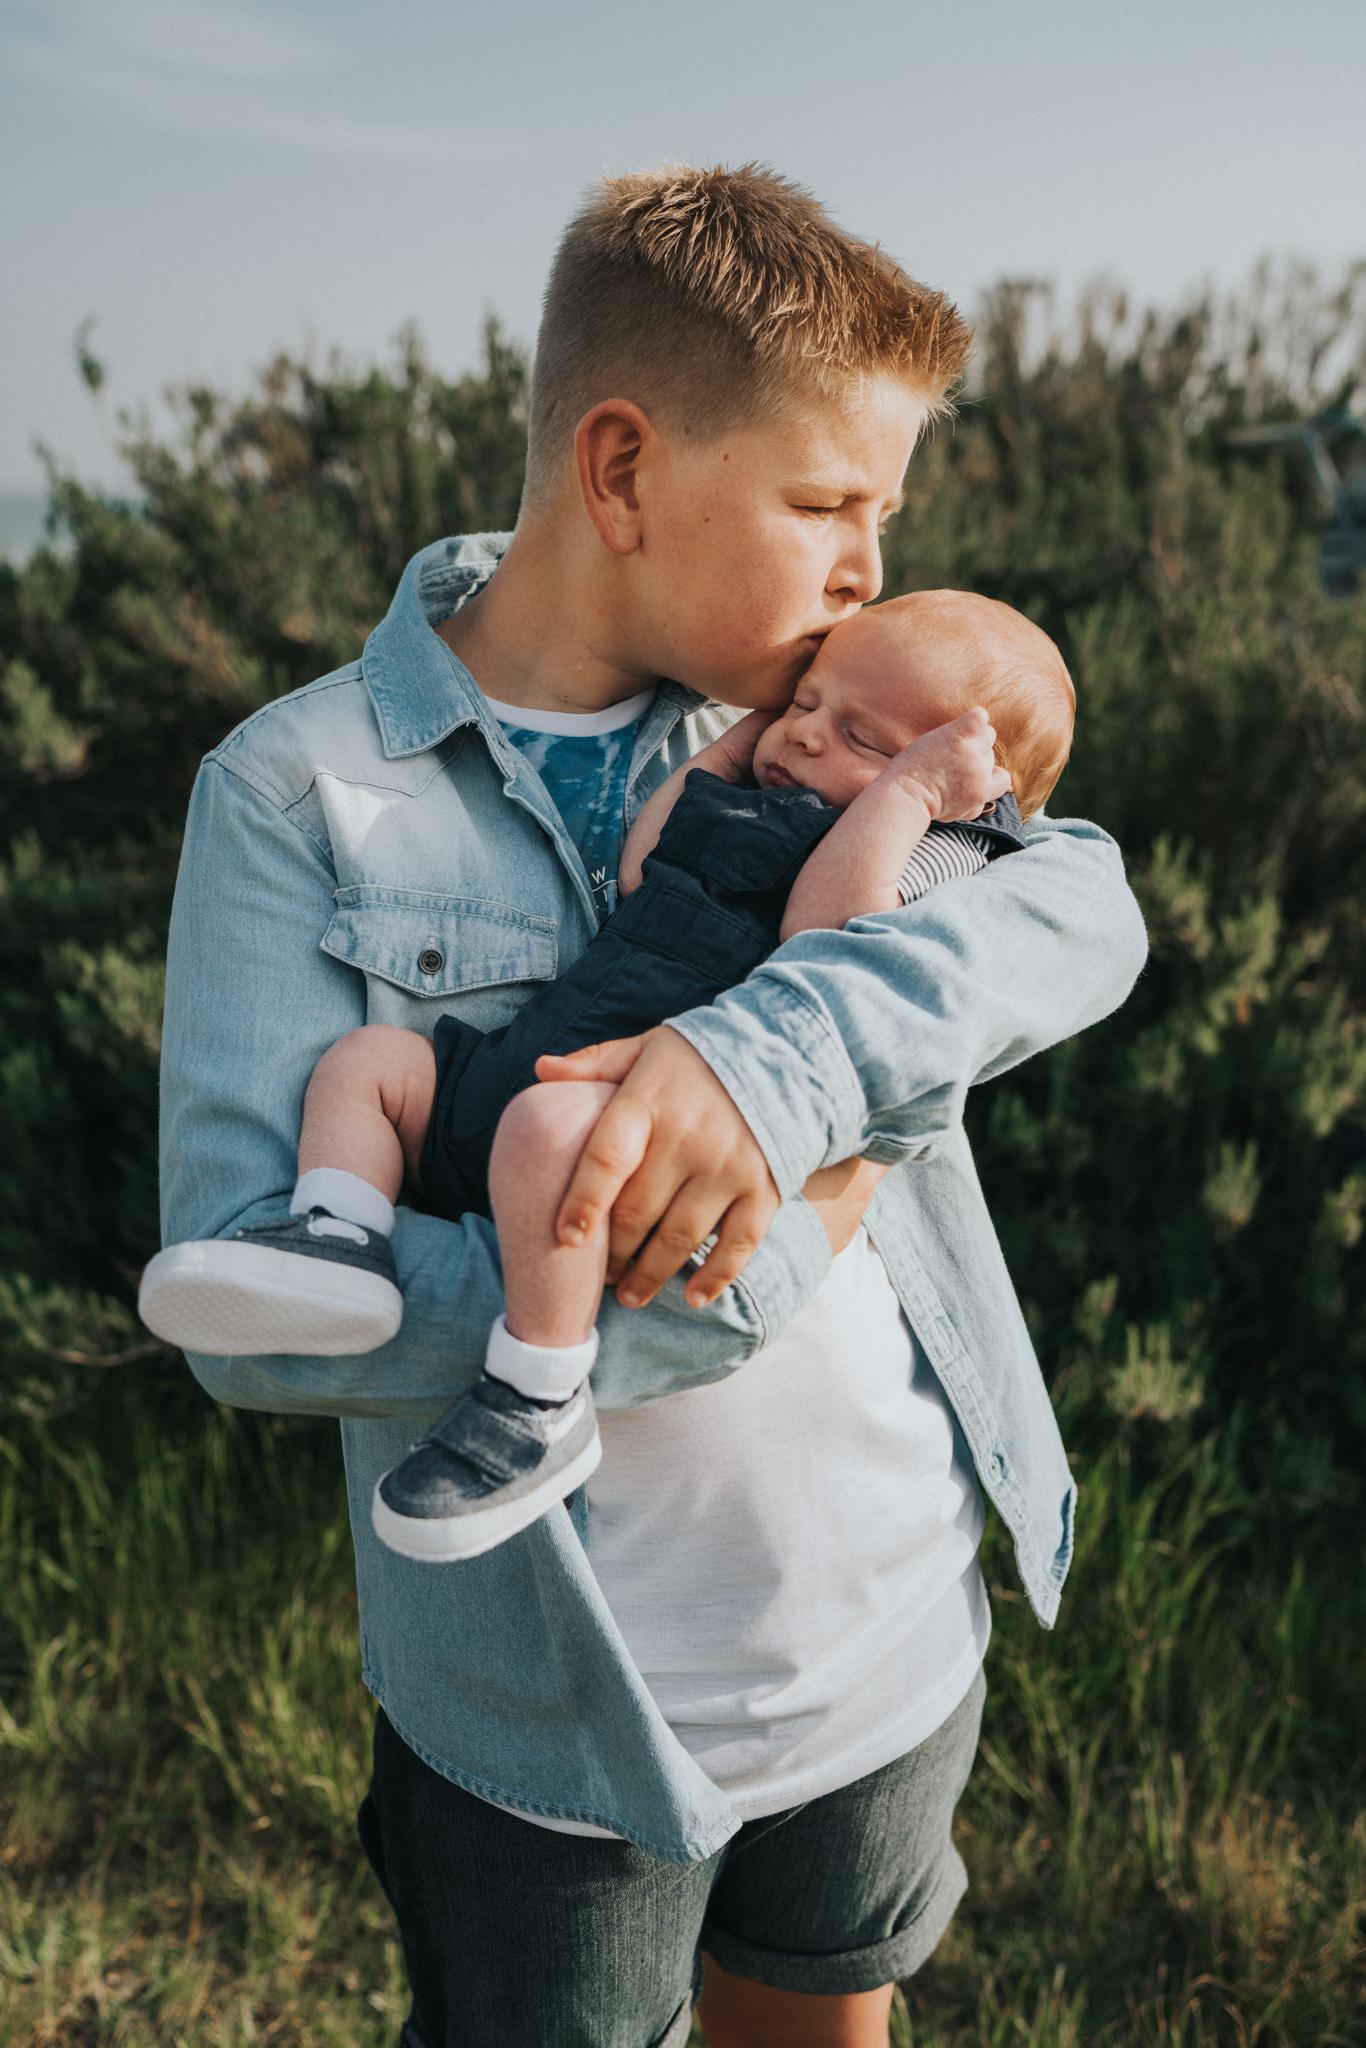 Newborn-Baby-Cooper-Grace-Elizabeth-Alternative-Wedding-Photographer-Colchester-Essex-Mersea-Island-19.jpg